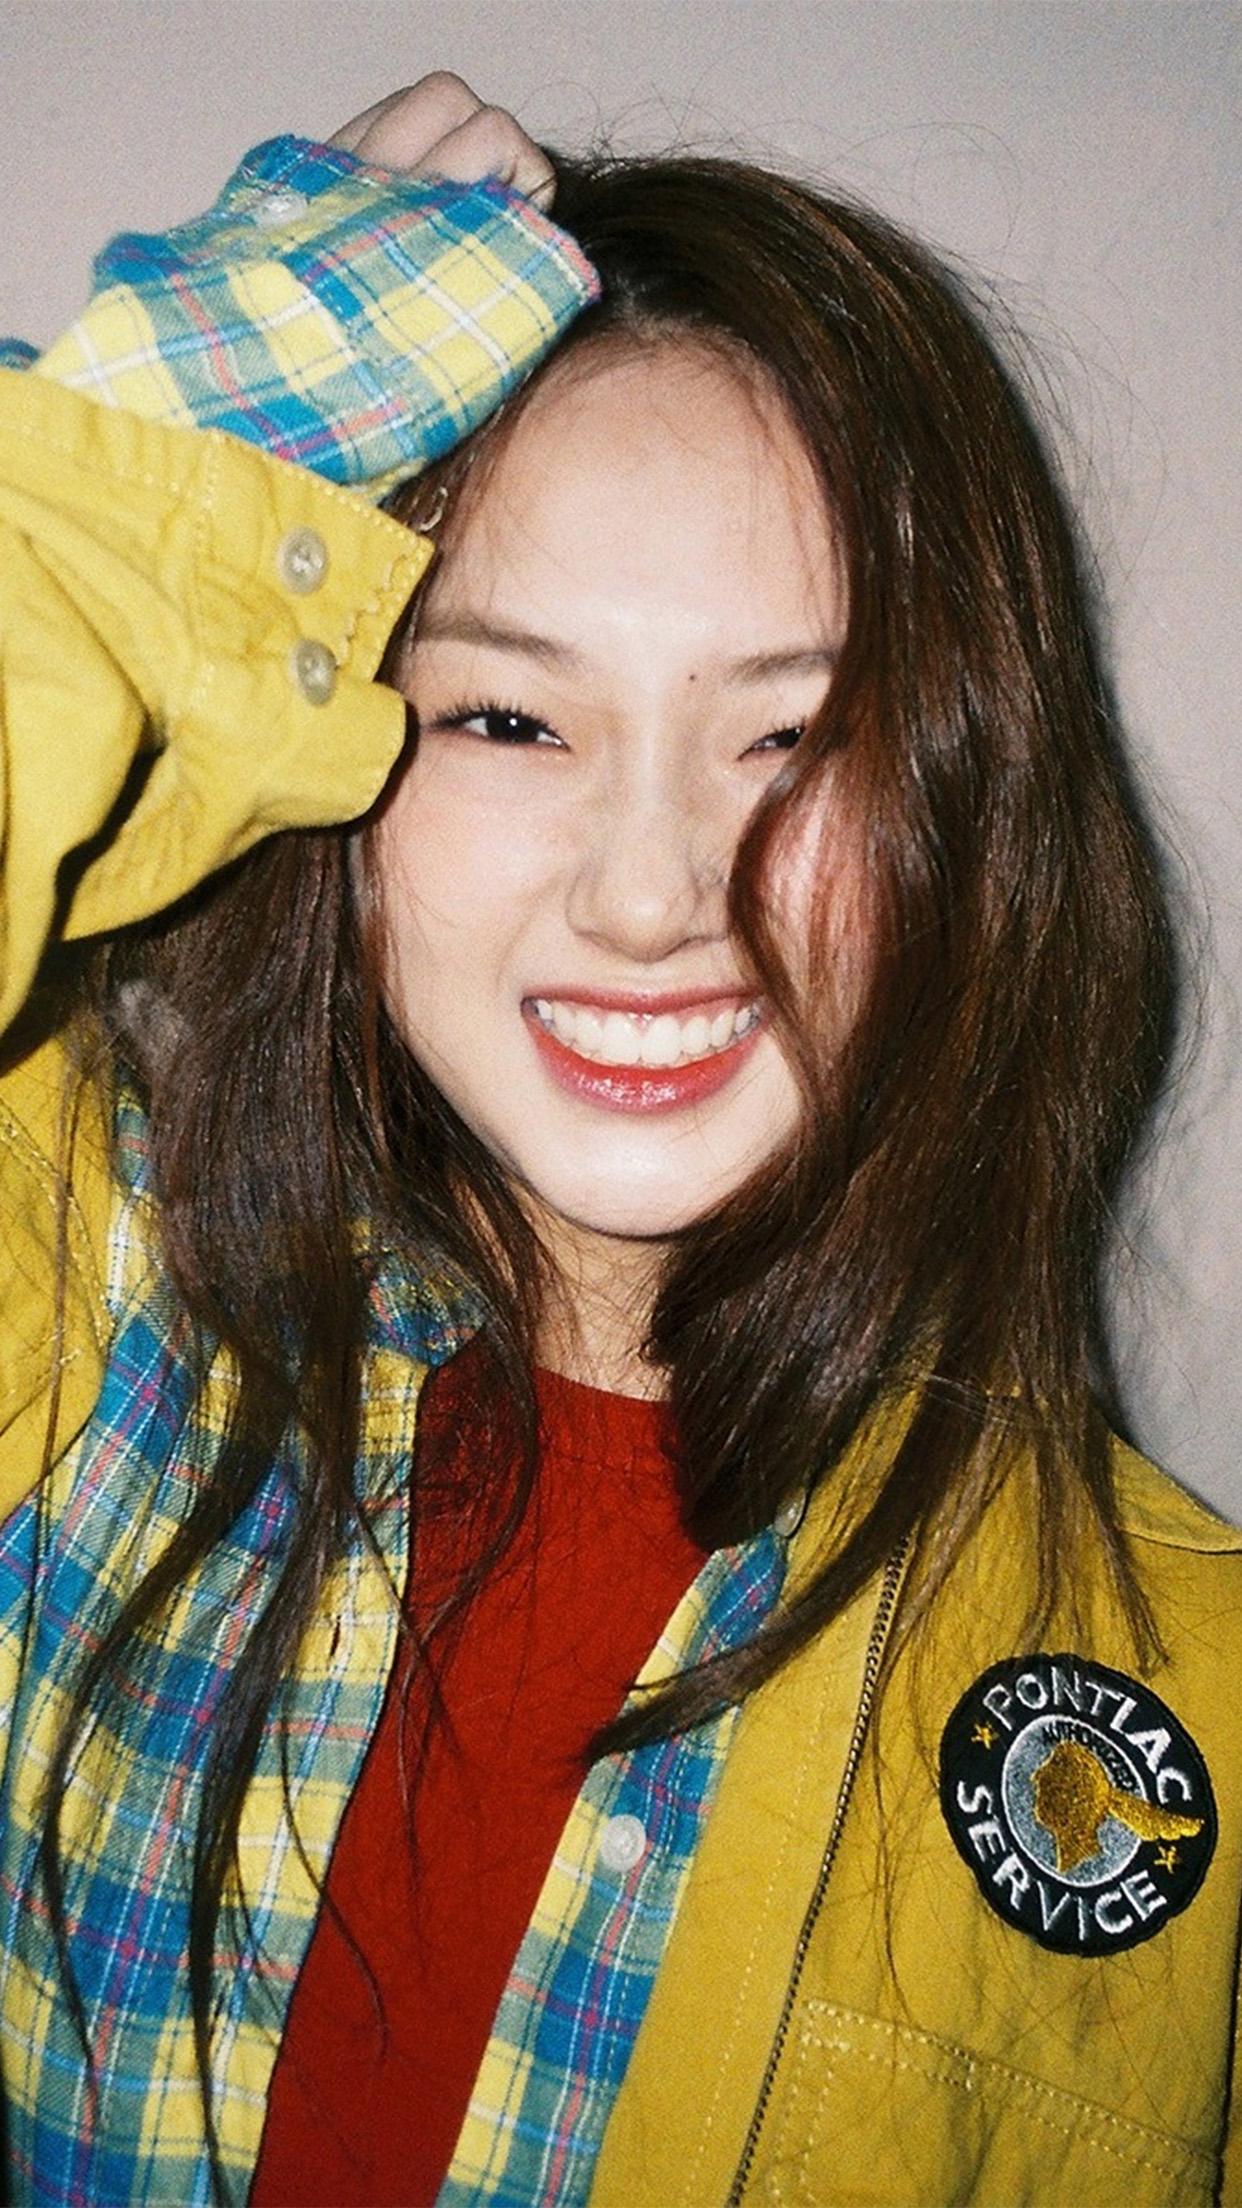 papers.co ho63 cute kpop girl pontlac korean asian 34 iphone6 plus wallpaper